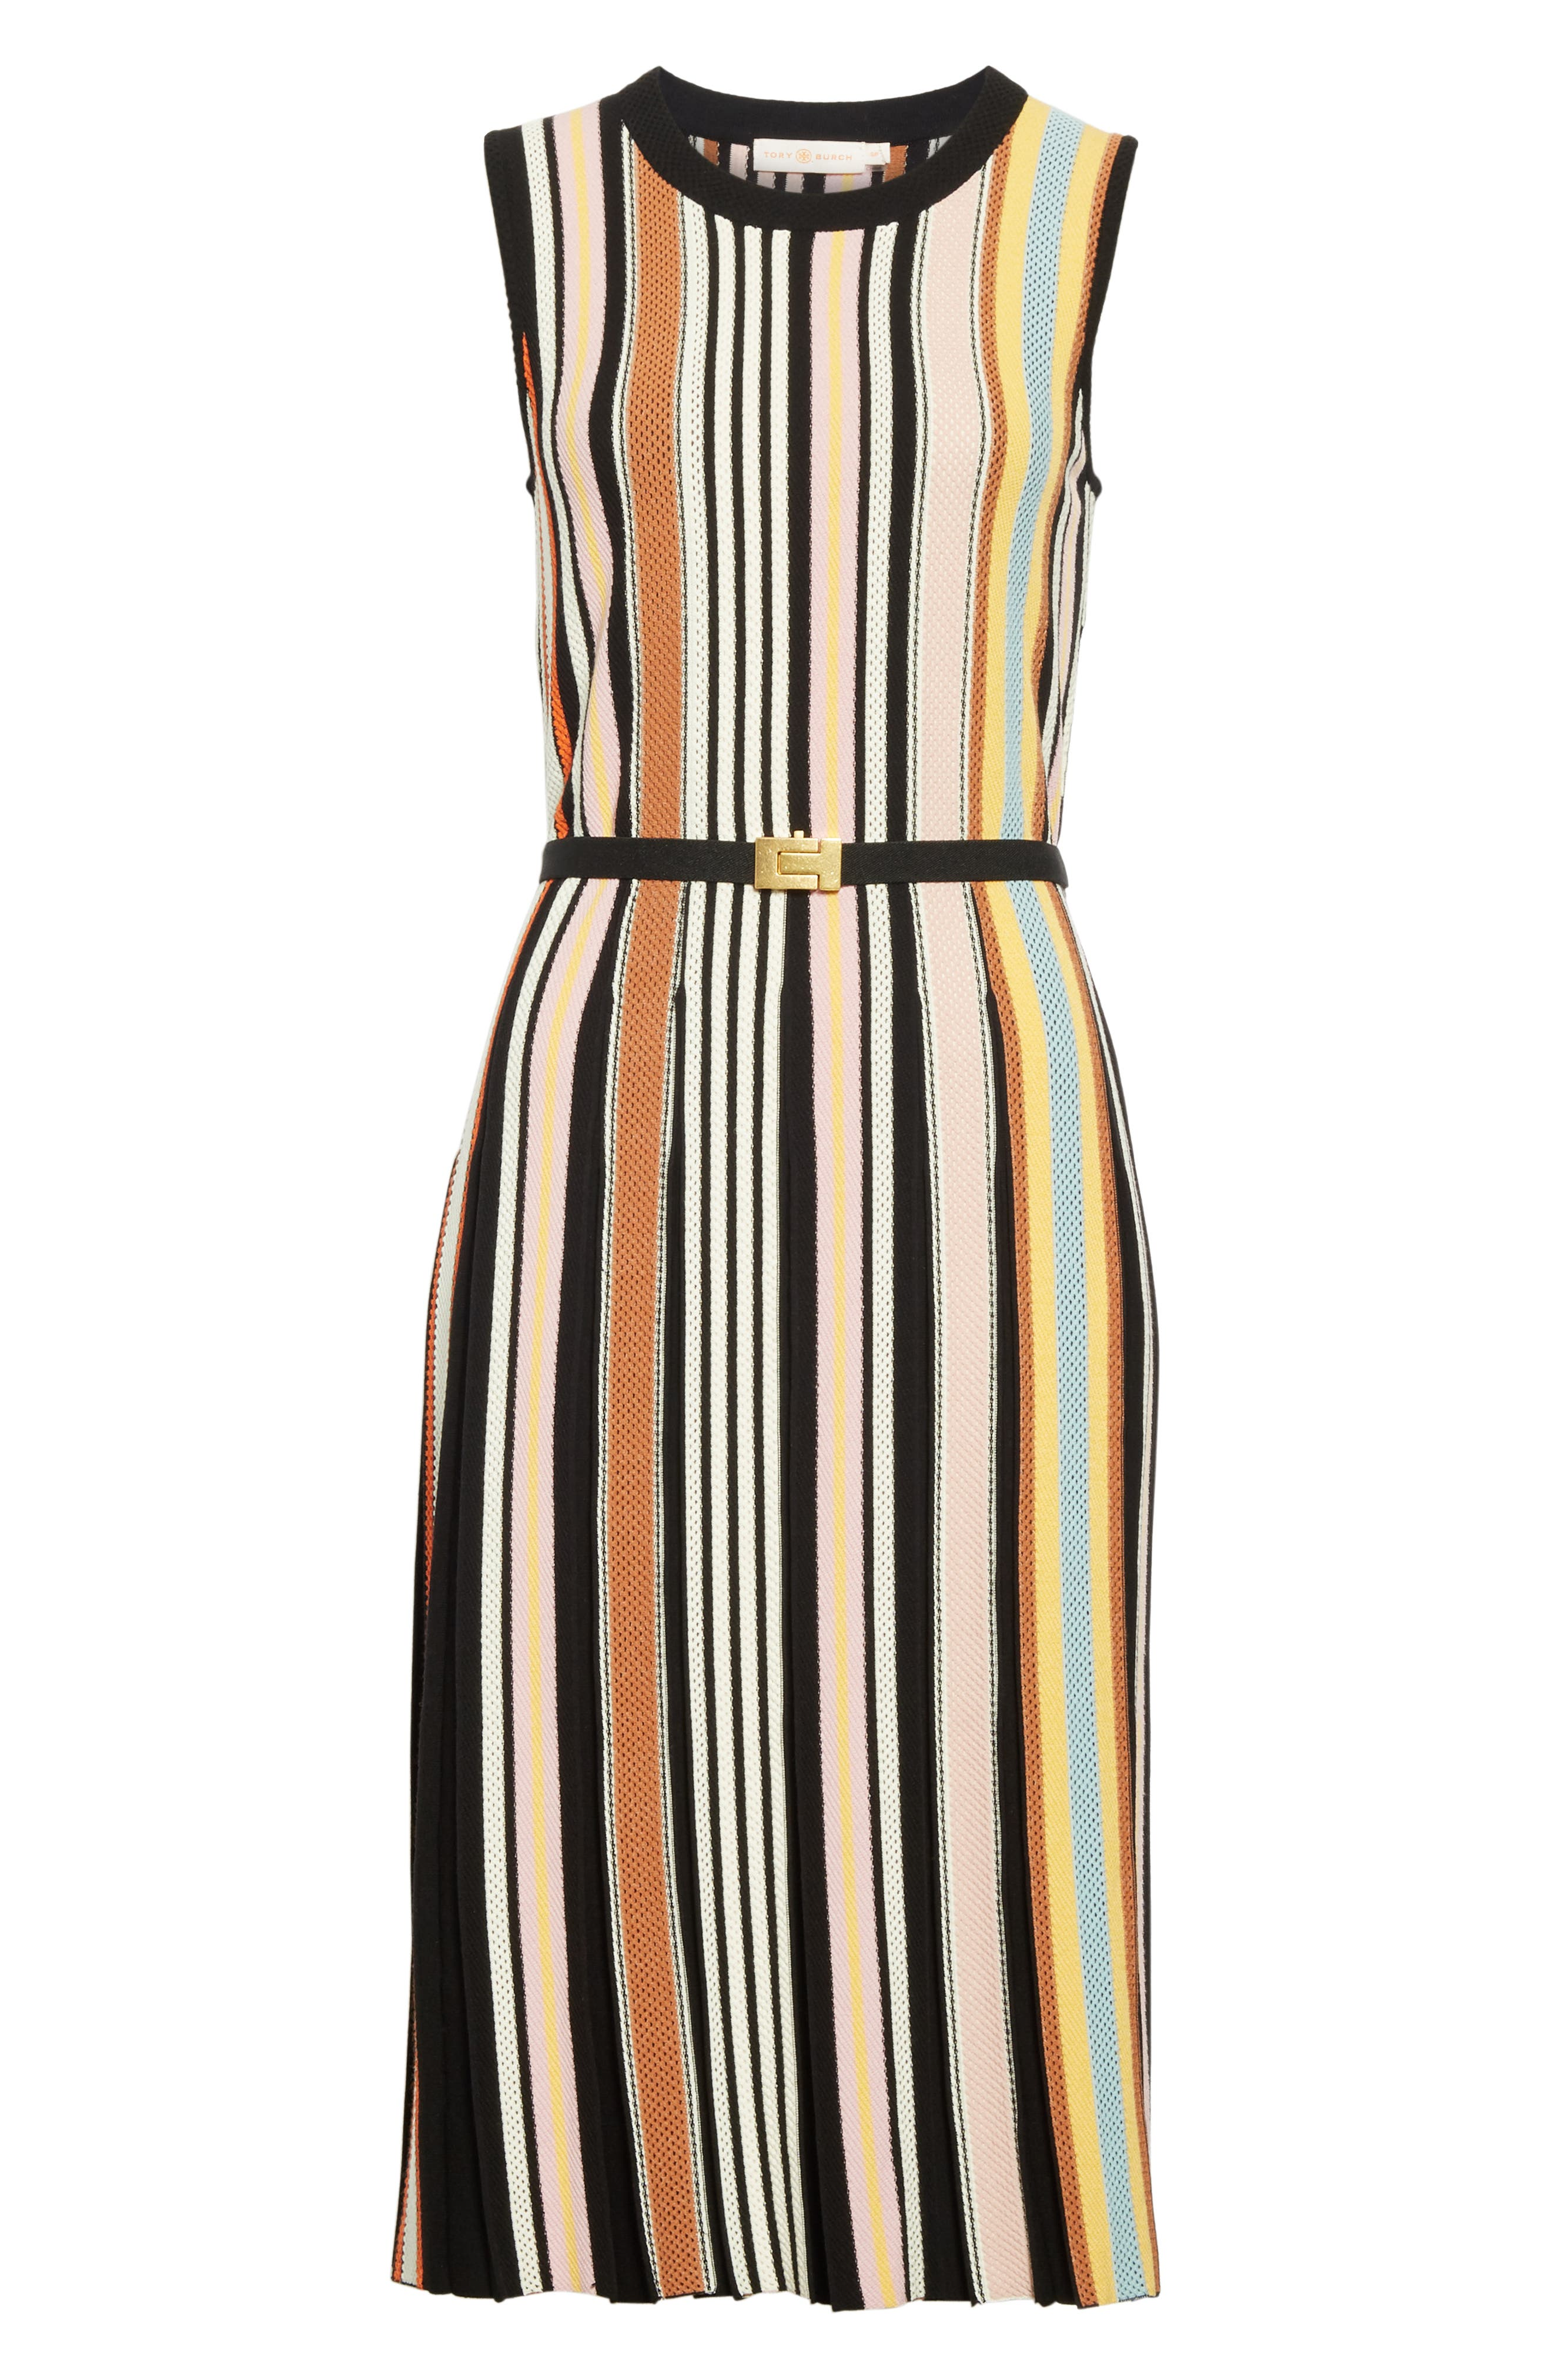 TORY BURCH, Stripe Sweater Dress, Alternate thumbnail 6, color, WEBBING STRIPE